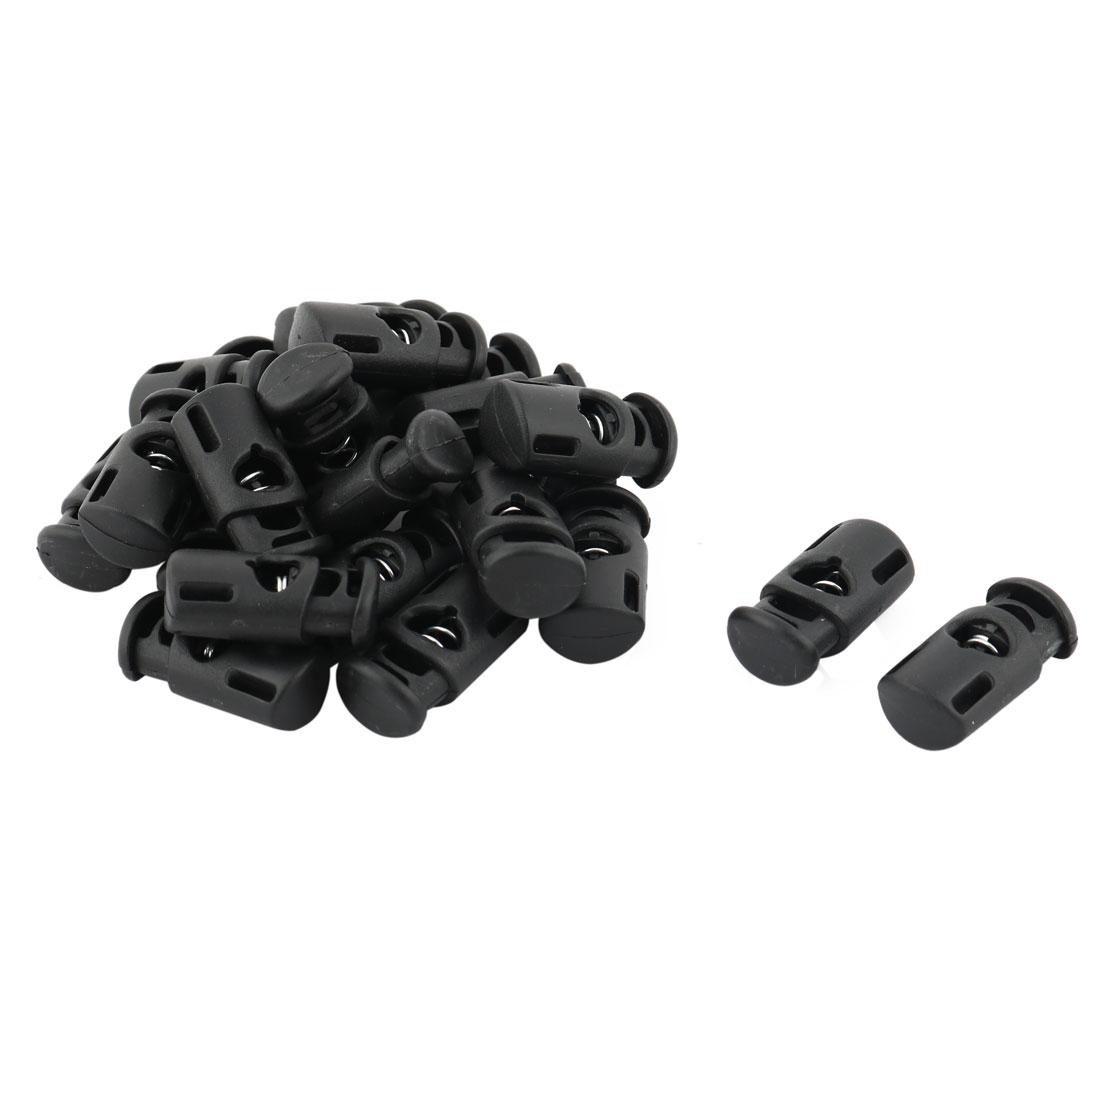 Plastic Single Hole Toggle Stopper Clothing Cap Cord Adjustive Lock Black 20 Pcs